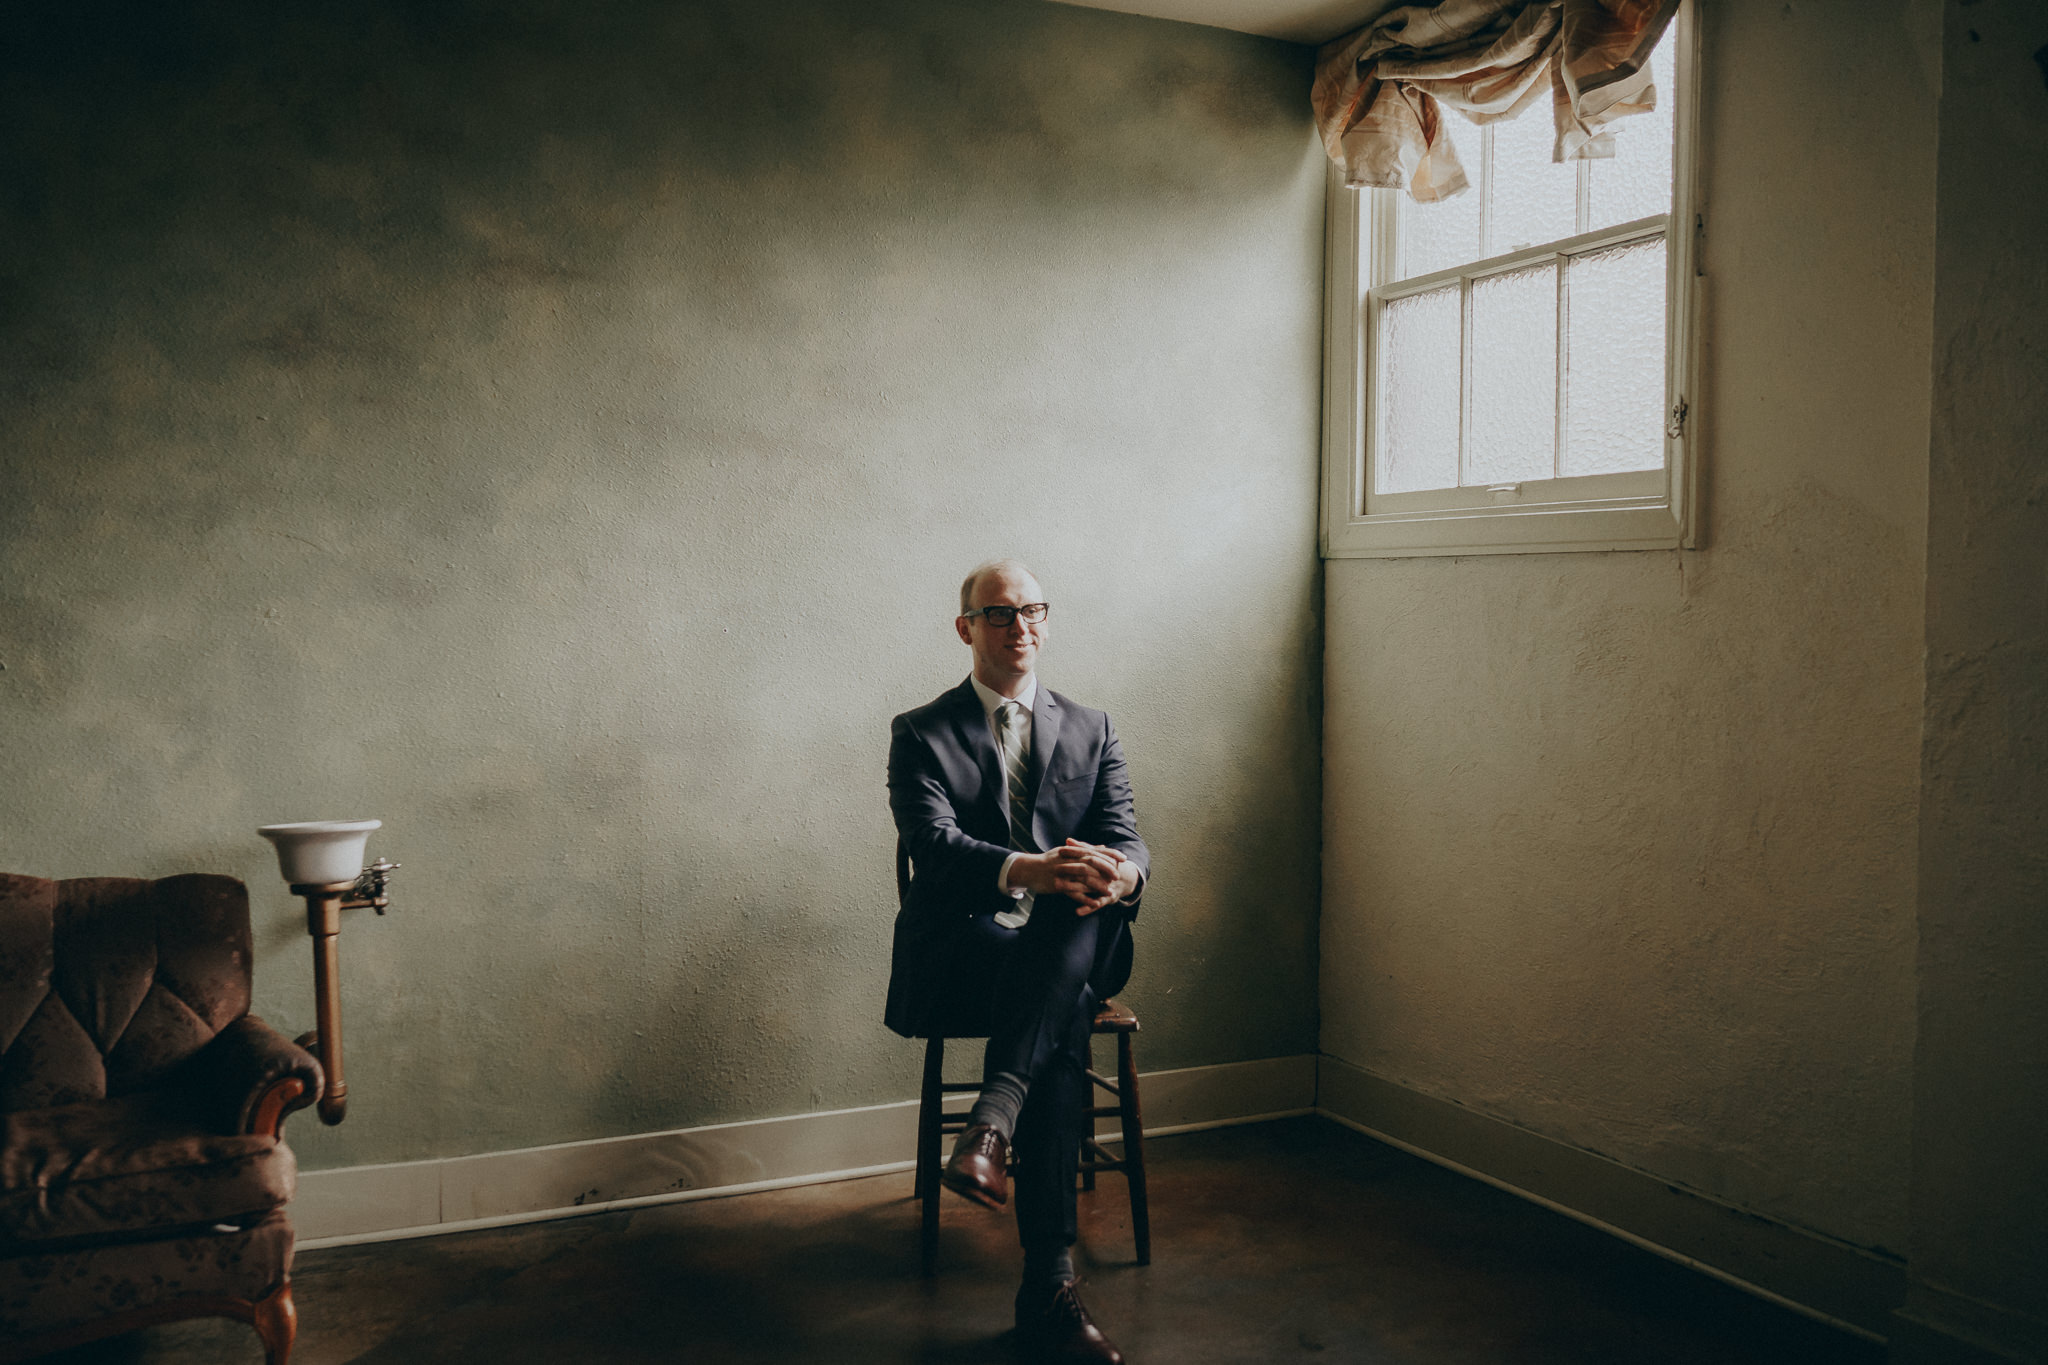 Groom-suit-Wedding-Portrait-Photographer